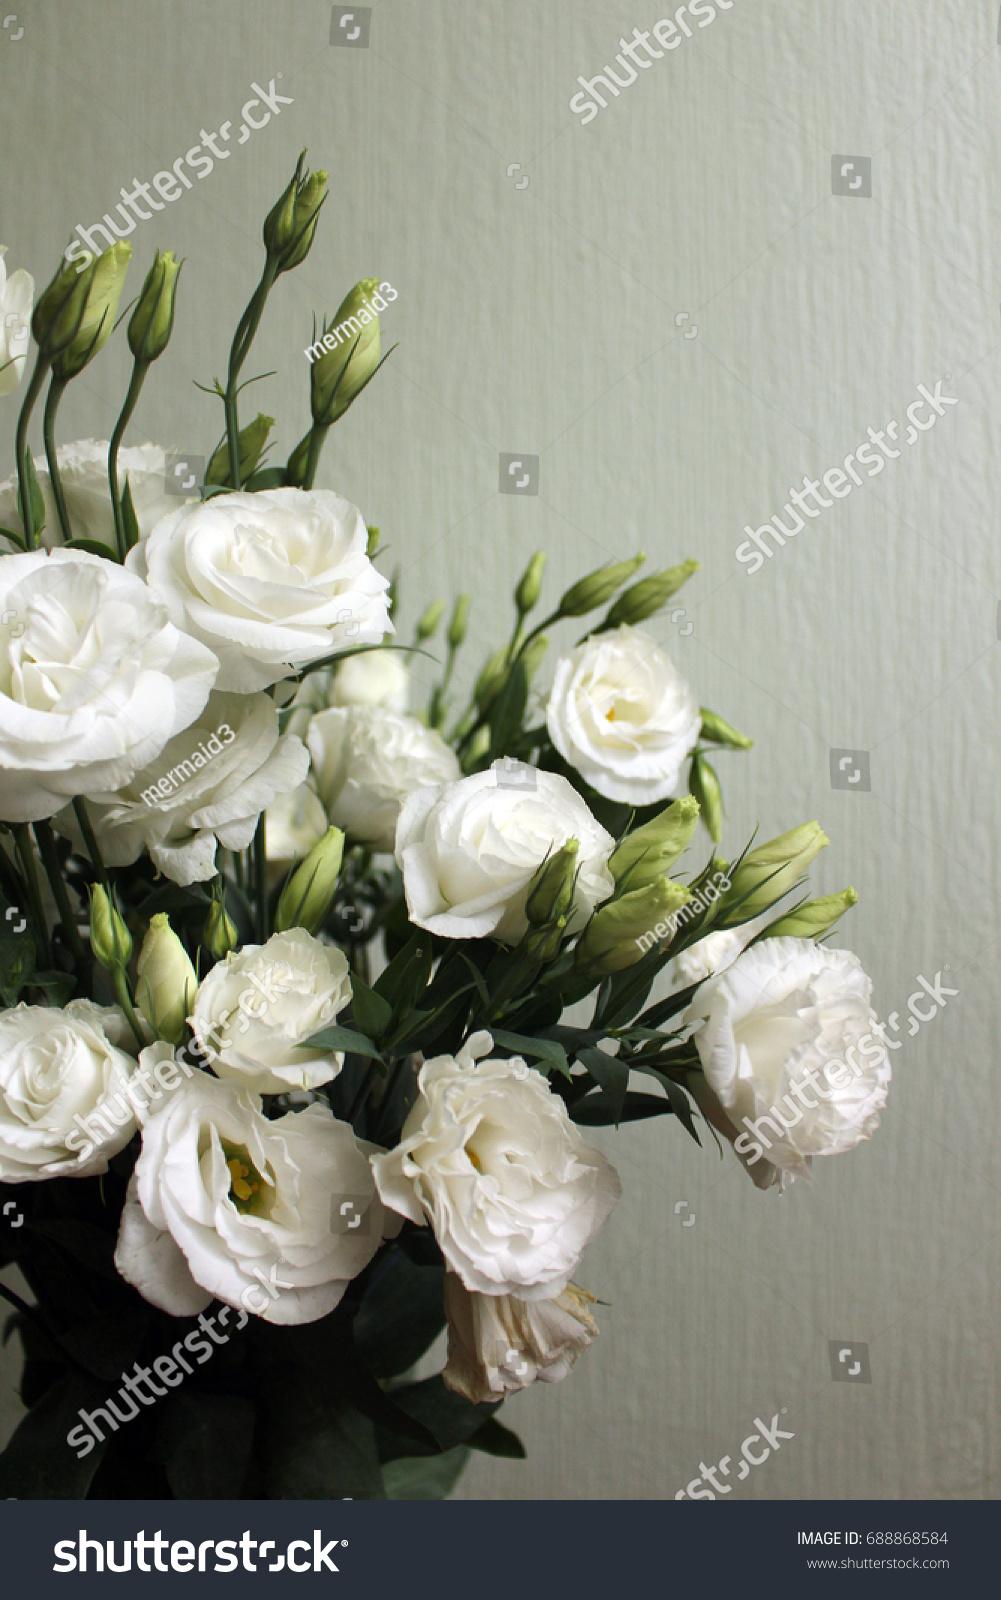 Eustom chinese rose cute bouquet flowers stock photo edit now eustom chinese rose cute bouquet of flowers izmirmasajfo